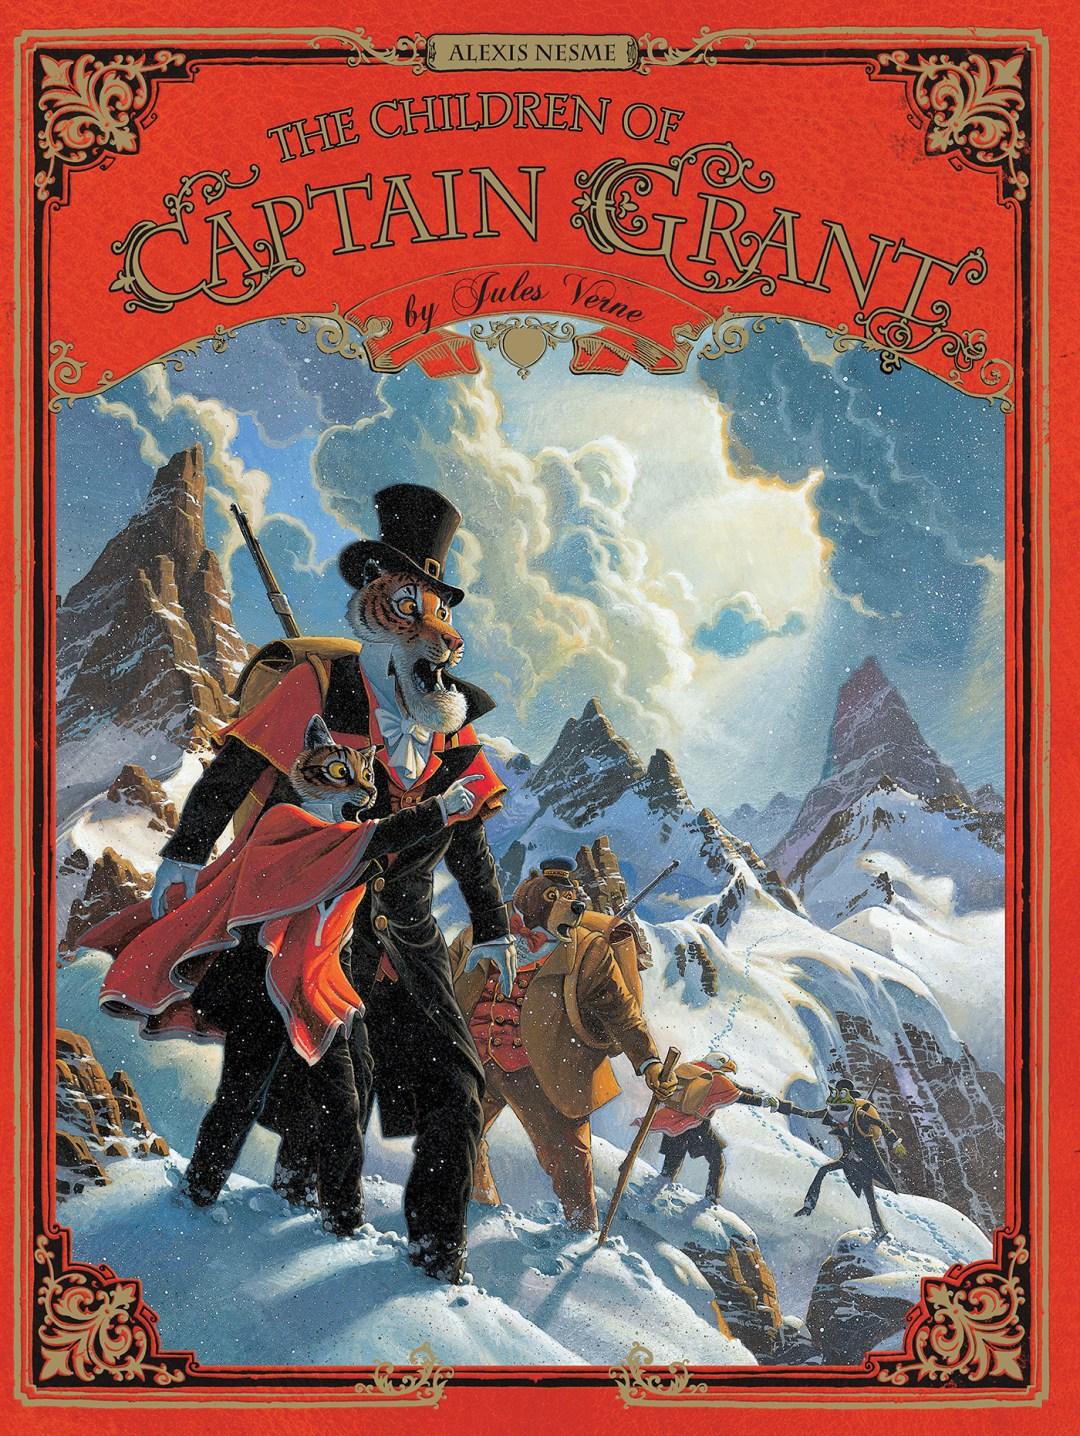 children_of_captain_grant_image